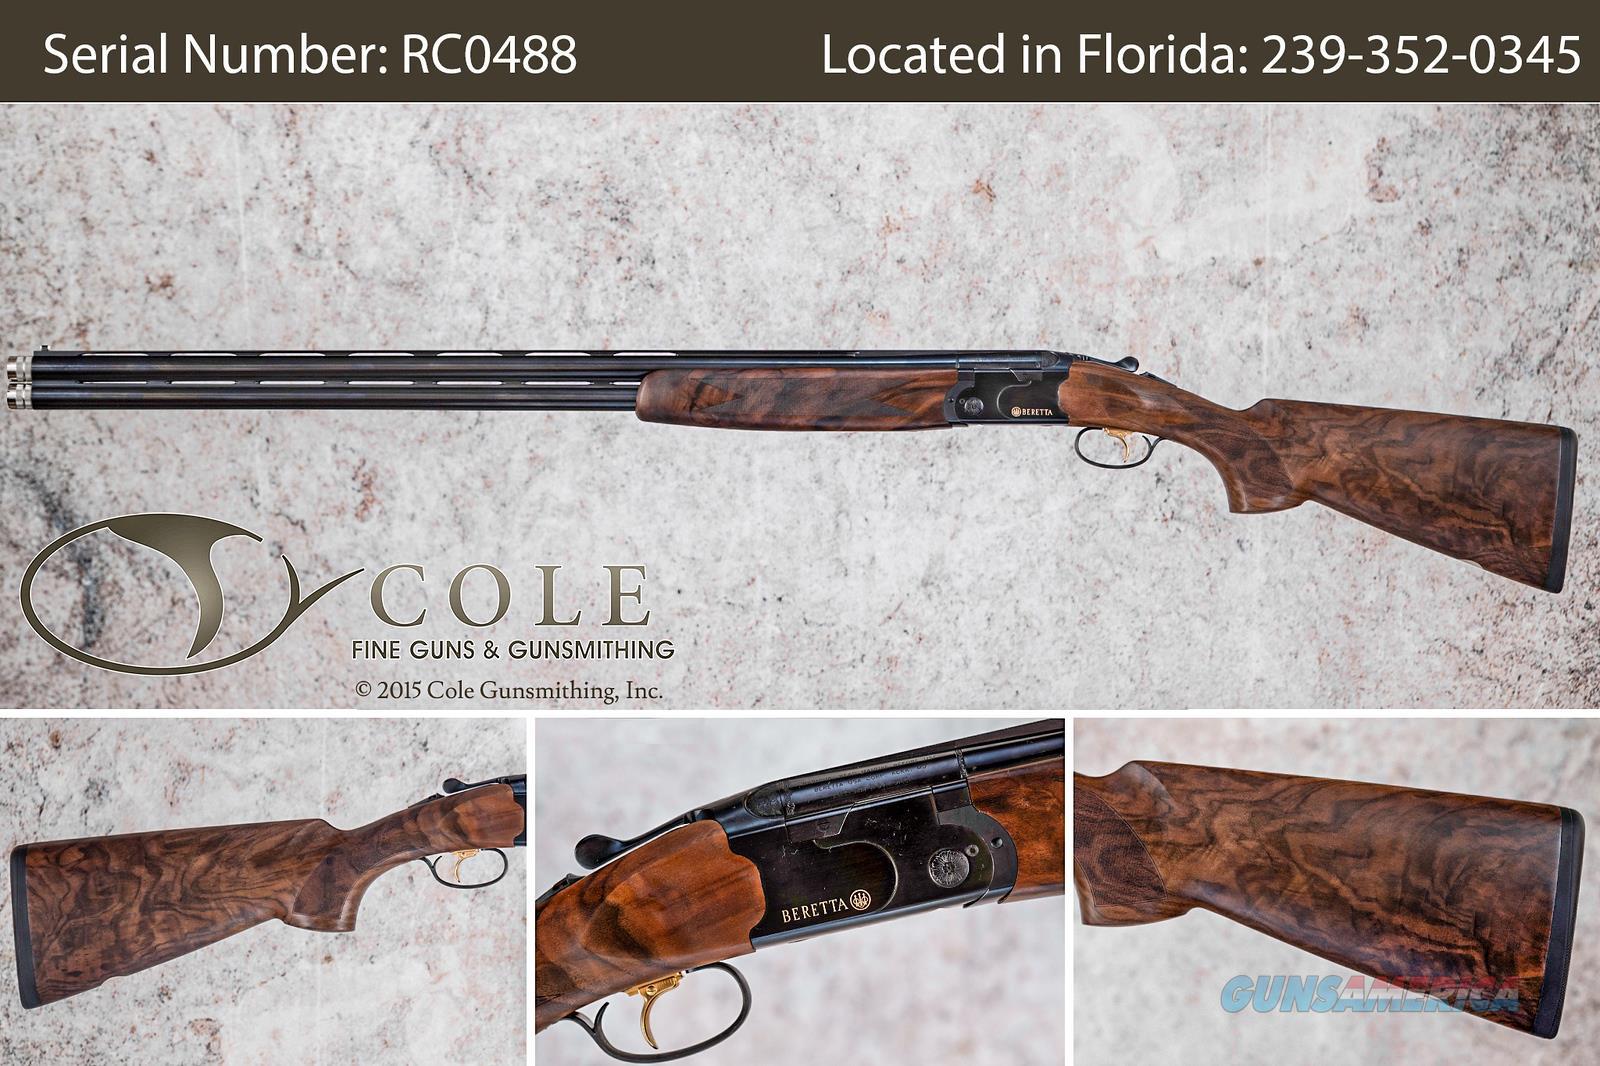 "Beretta 686 Cole Special 12ga 32"" Sporting Shotgun SN:#RC0488  Guns > Shotguns > Beretta Shotguns > O/U > Trap/Skeet"